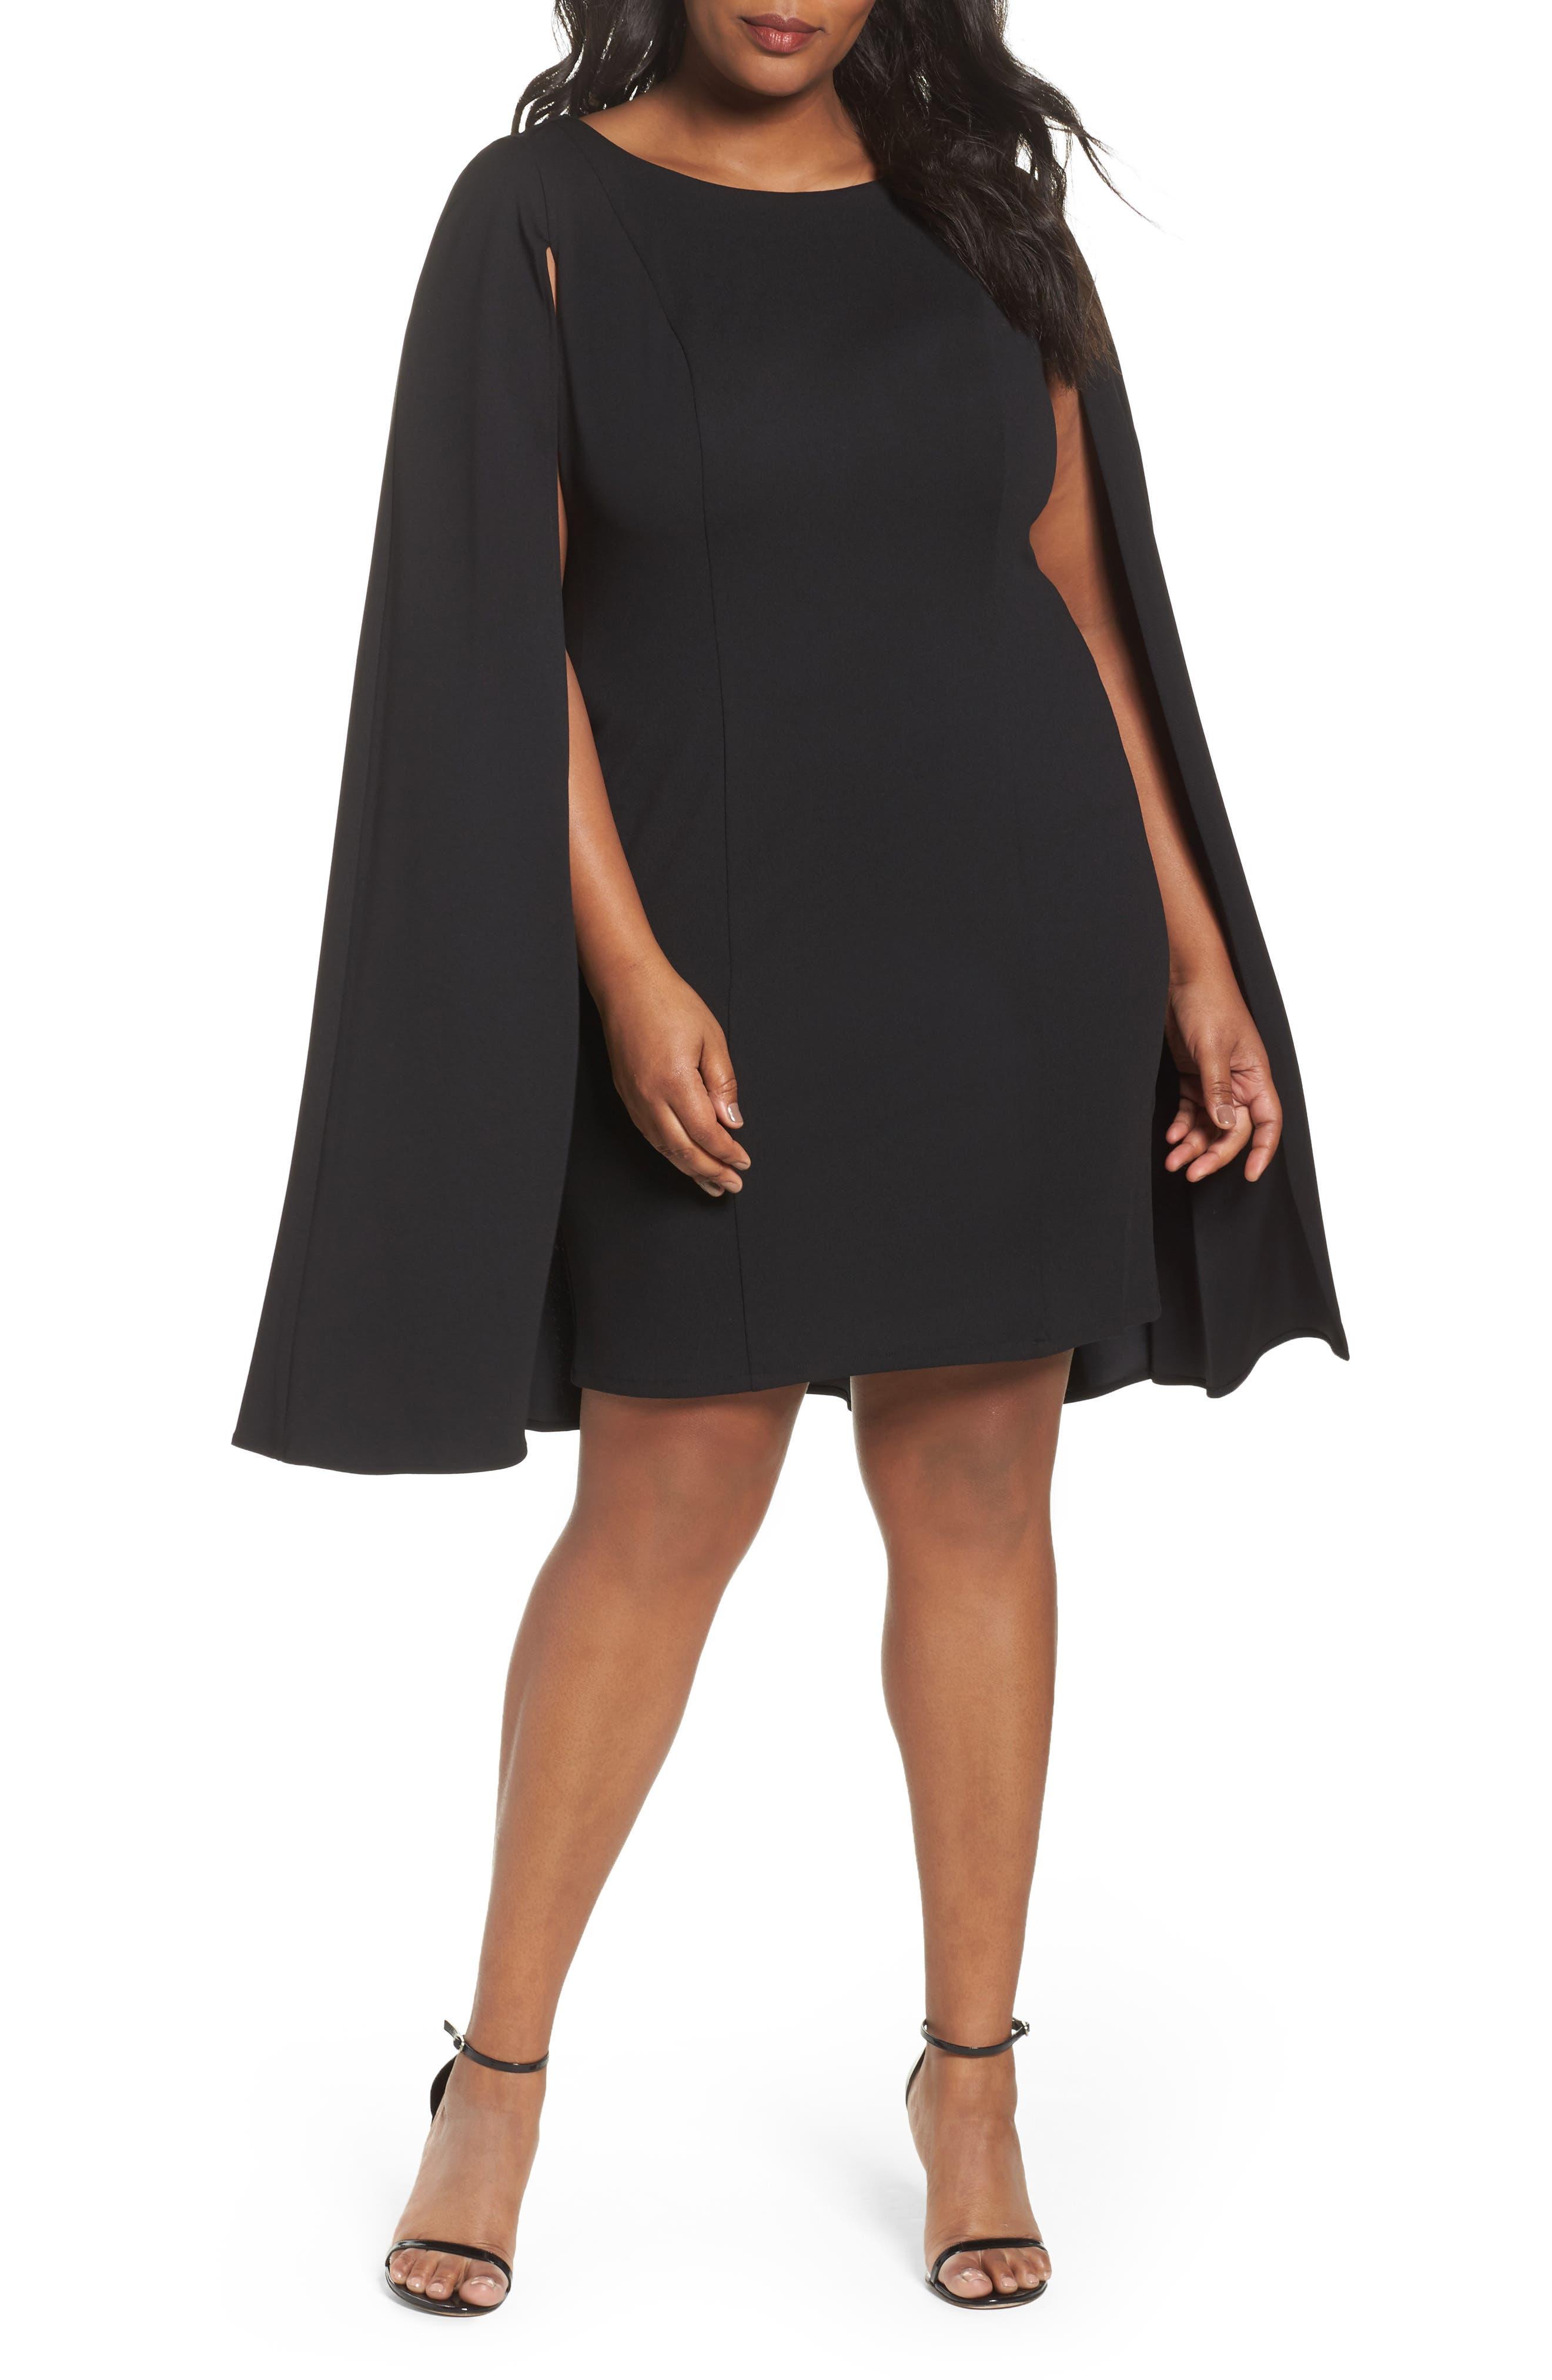 Alternate Image 1 Selected - Adrianna Papell Cape Sheath Dress (Plus Size)